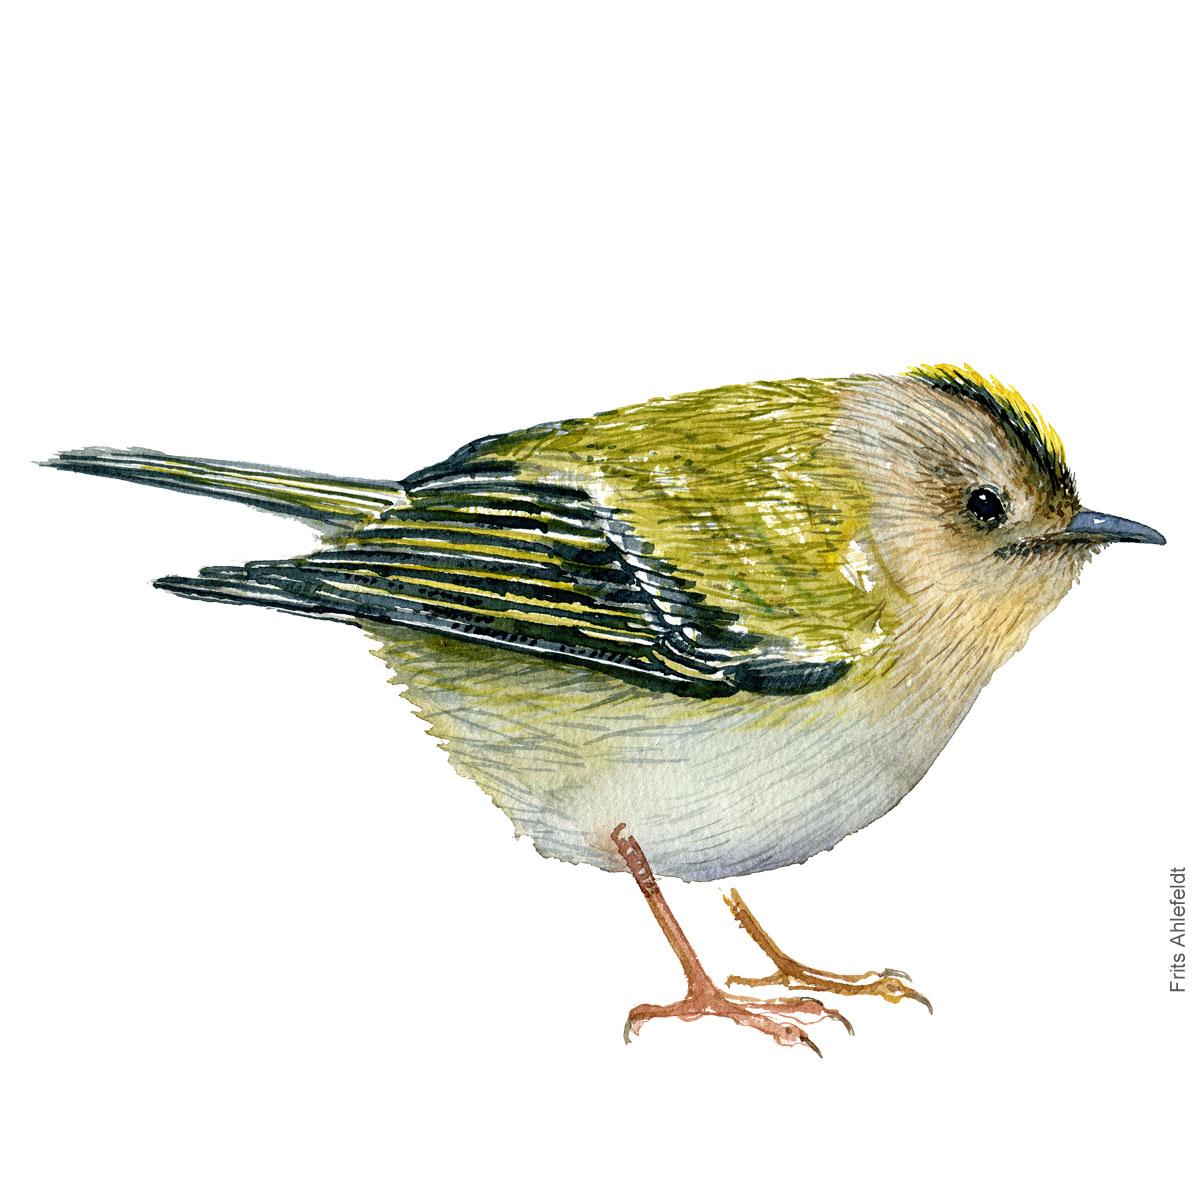 Goldcrest, Fuglekonge akvarel. Watercolor painting by Frits Ahlefeldt